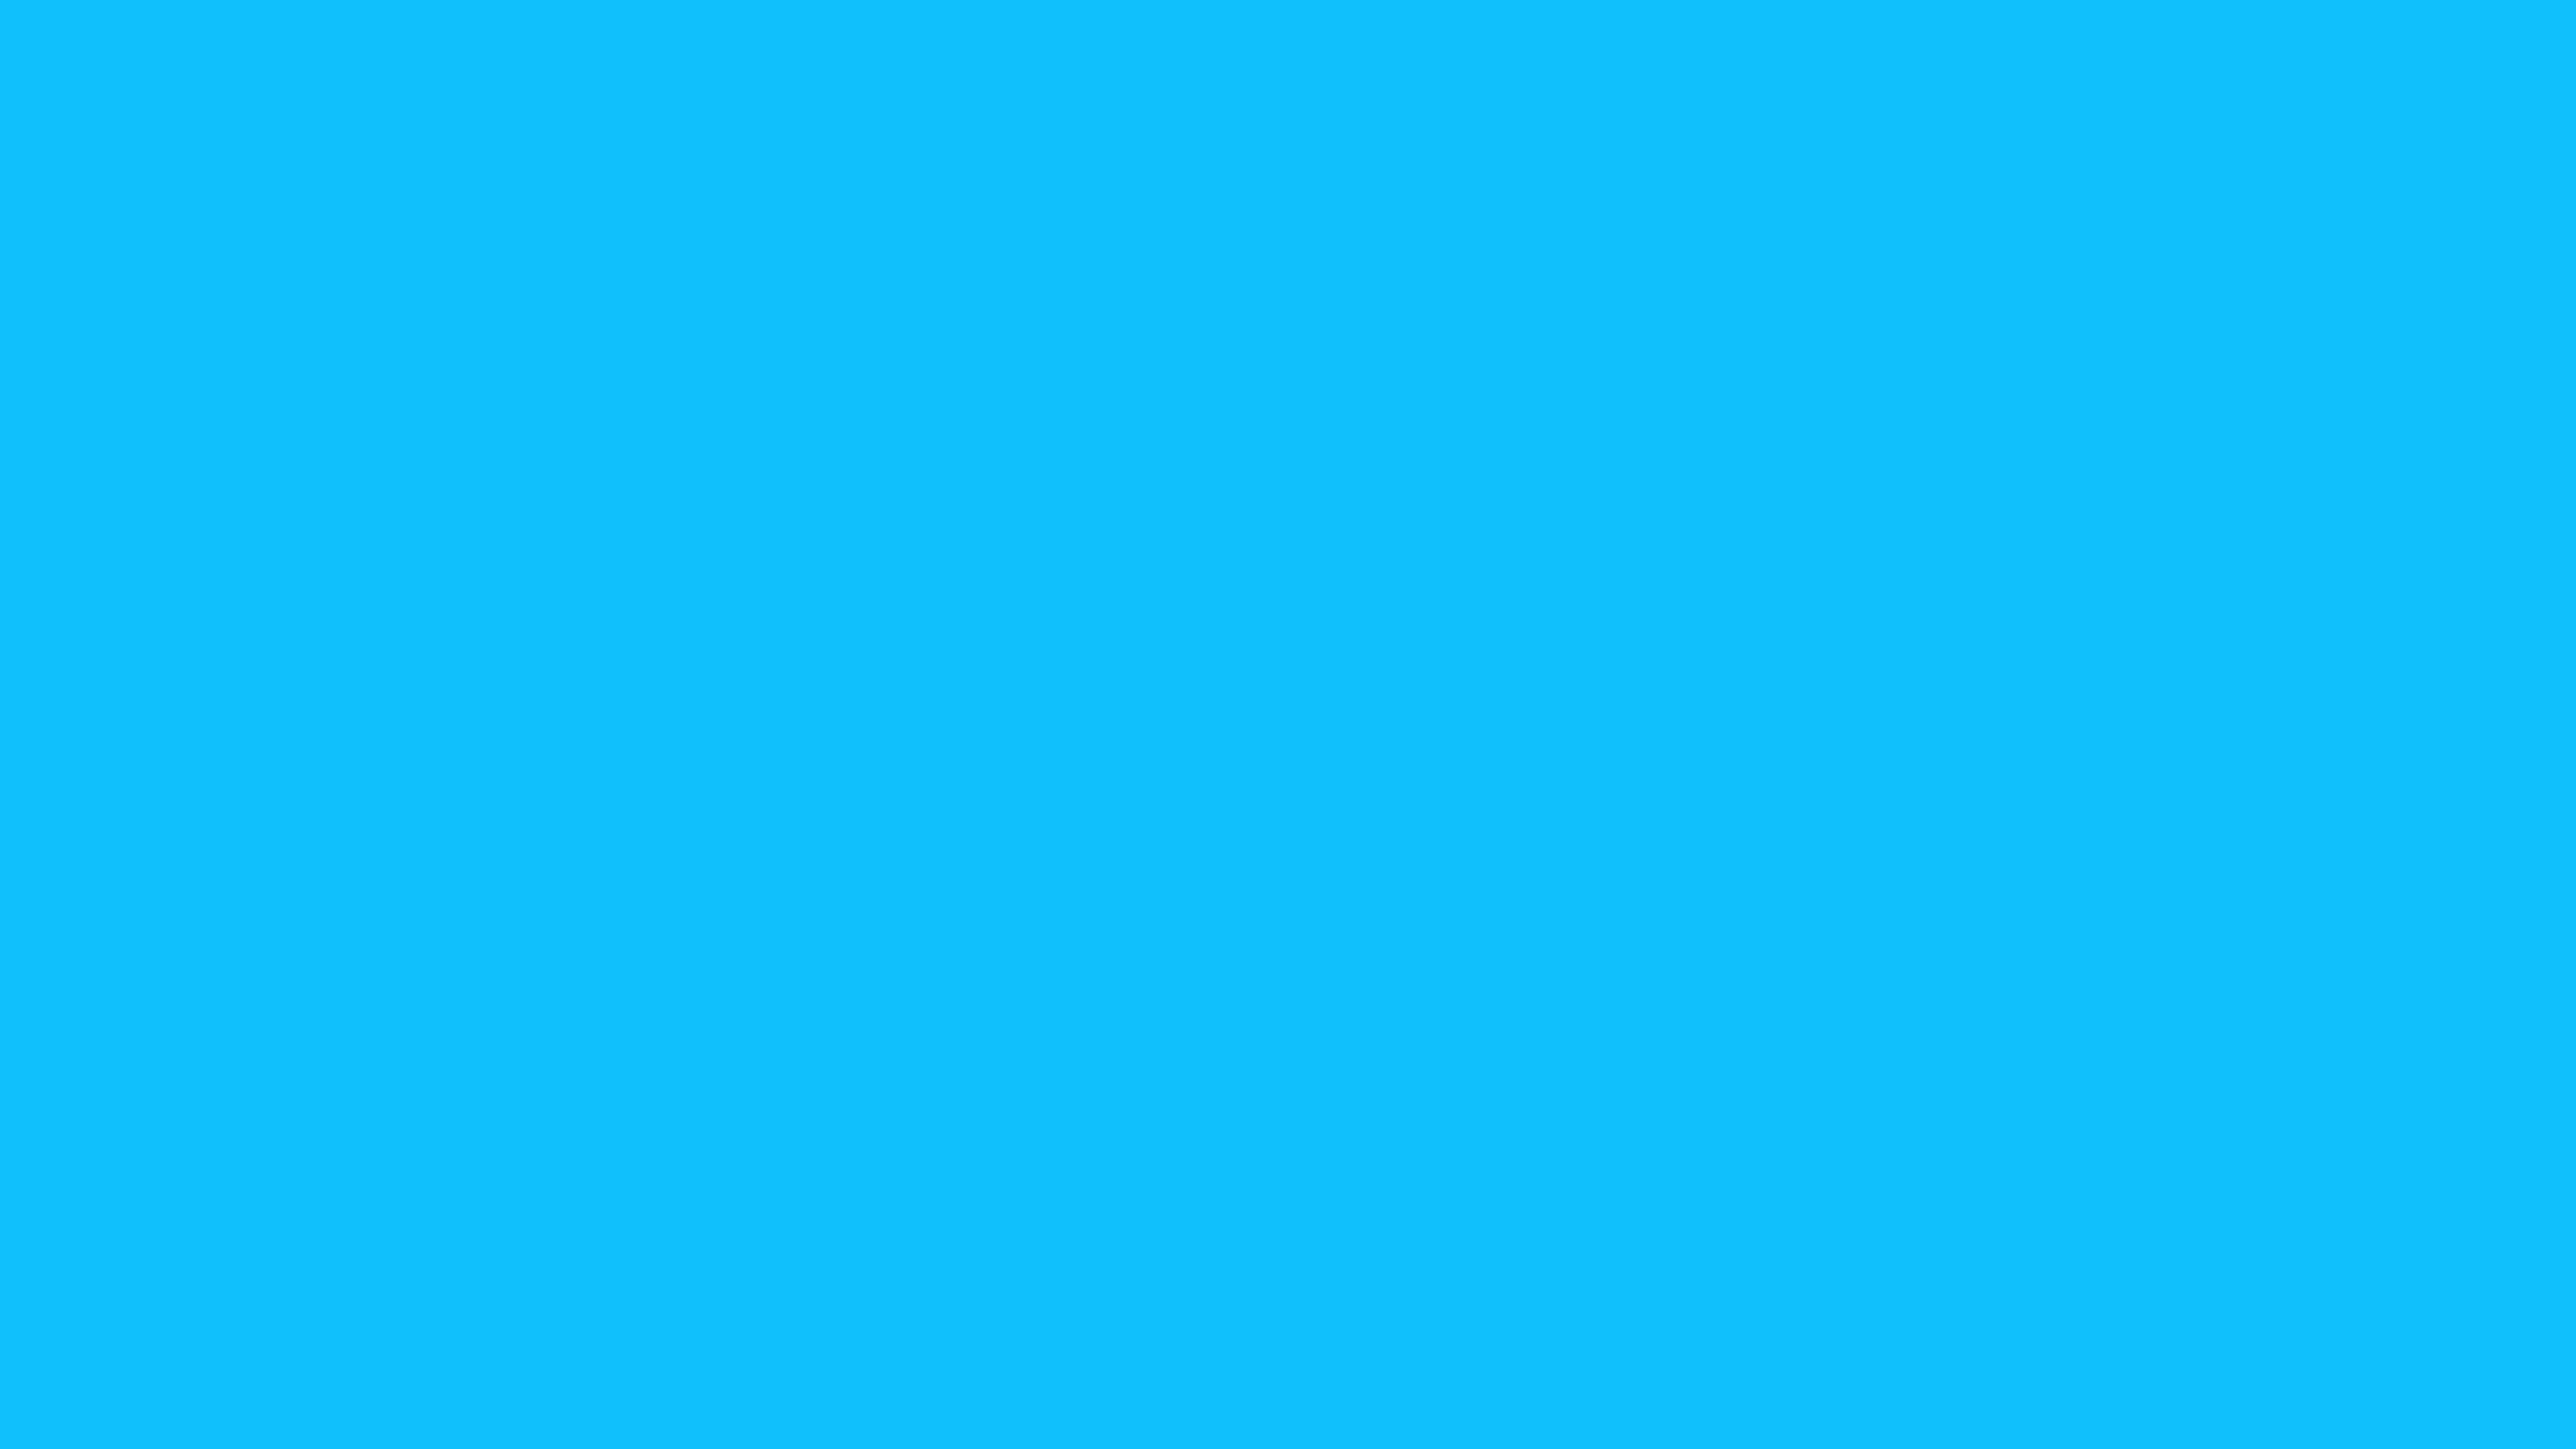 3840x2160 Spiro Disco Ball Solid Color Background